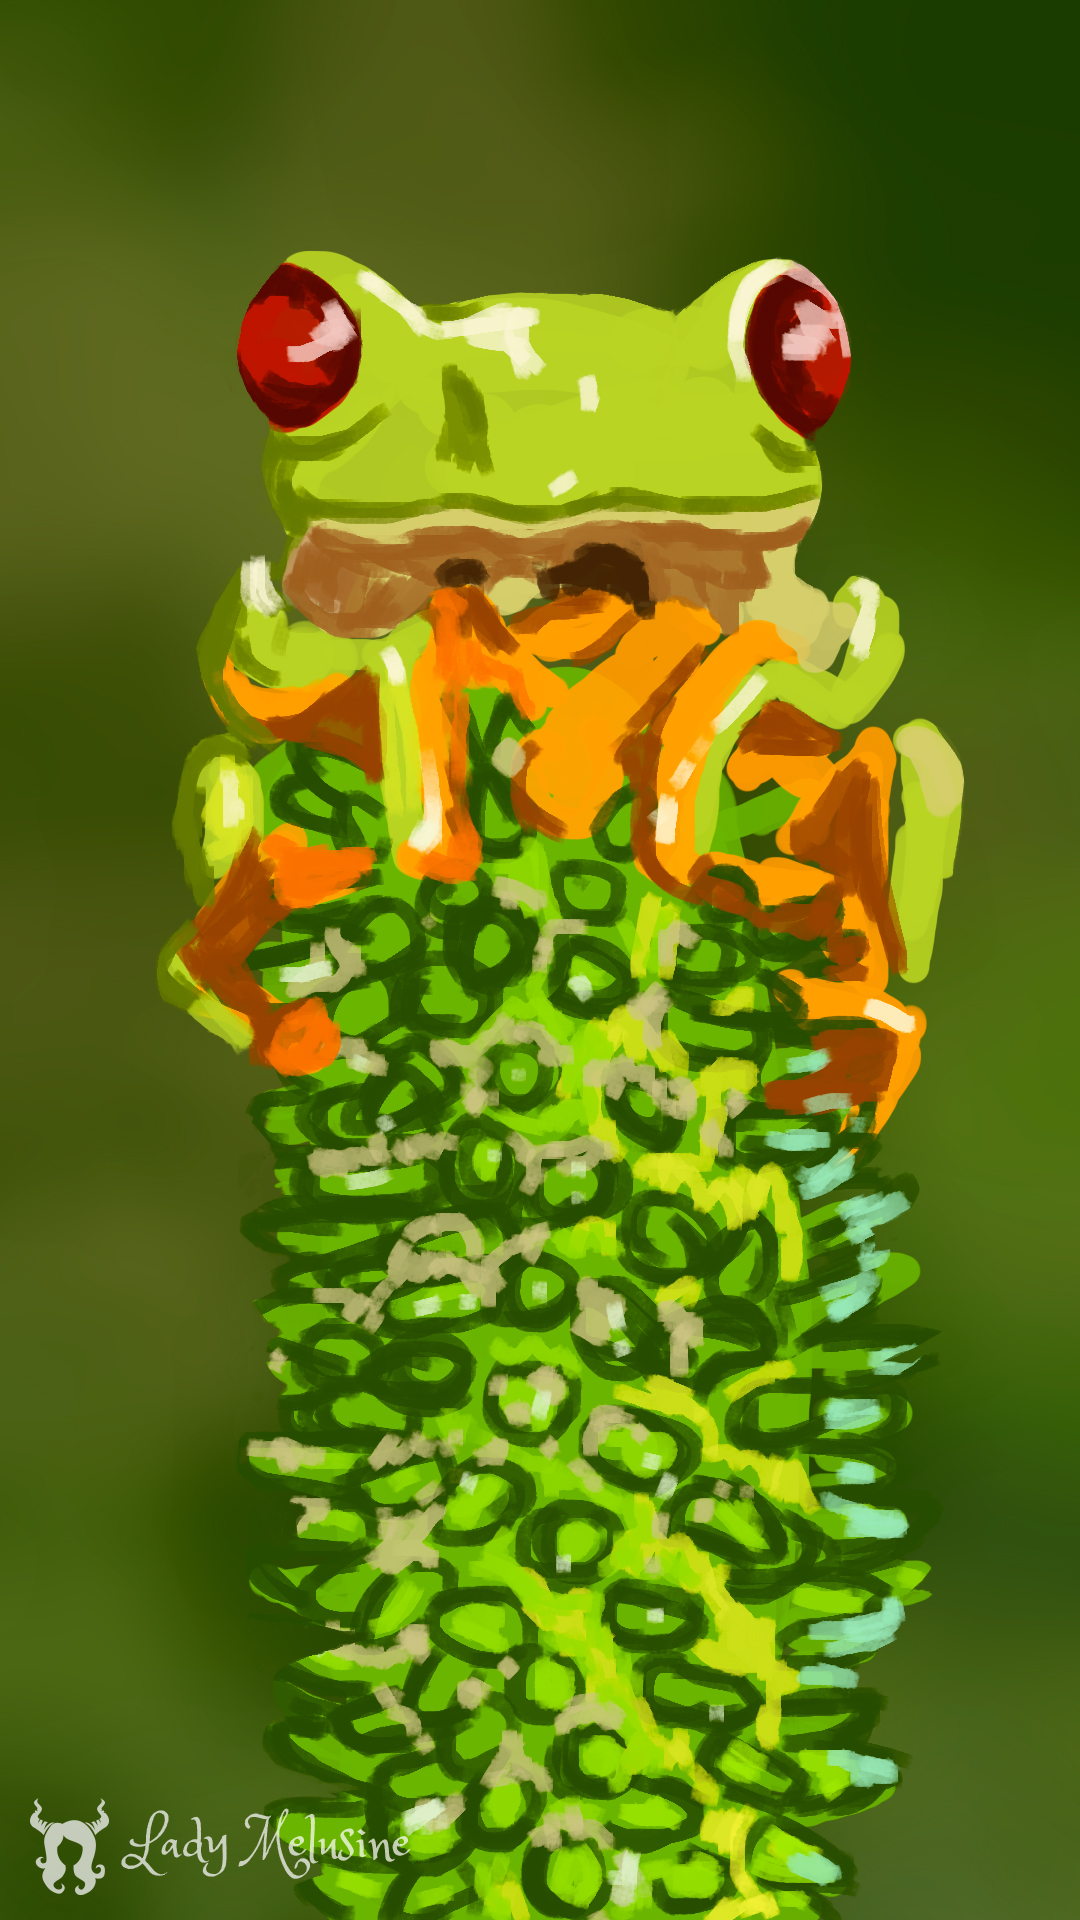 Digital Painting grenouille 05 Lady Melusine